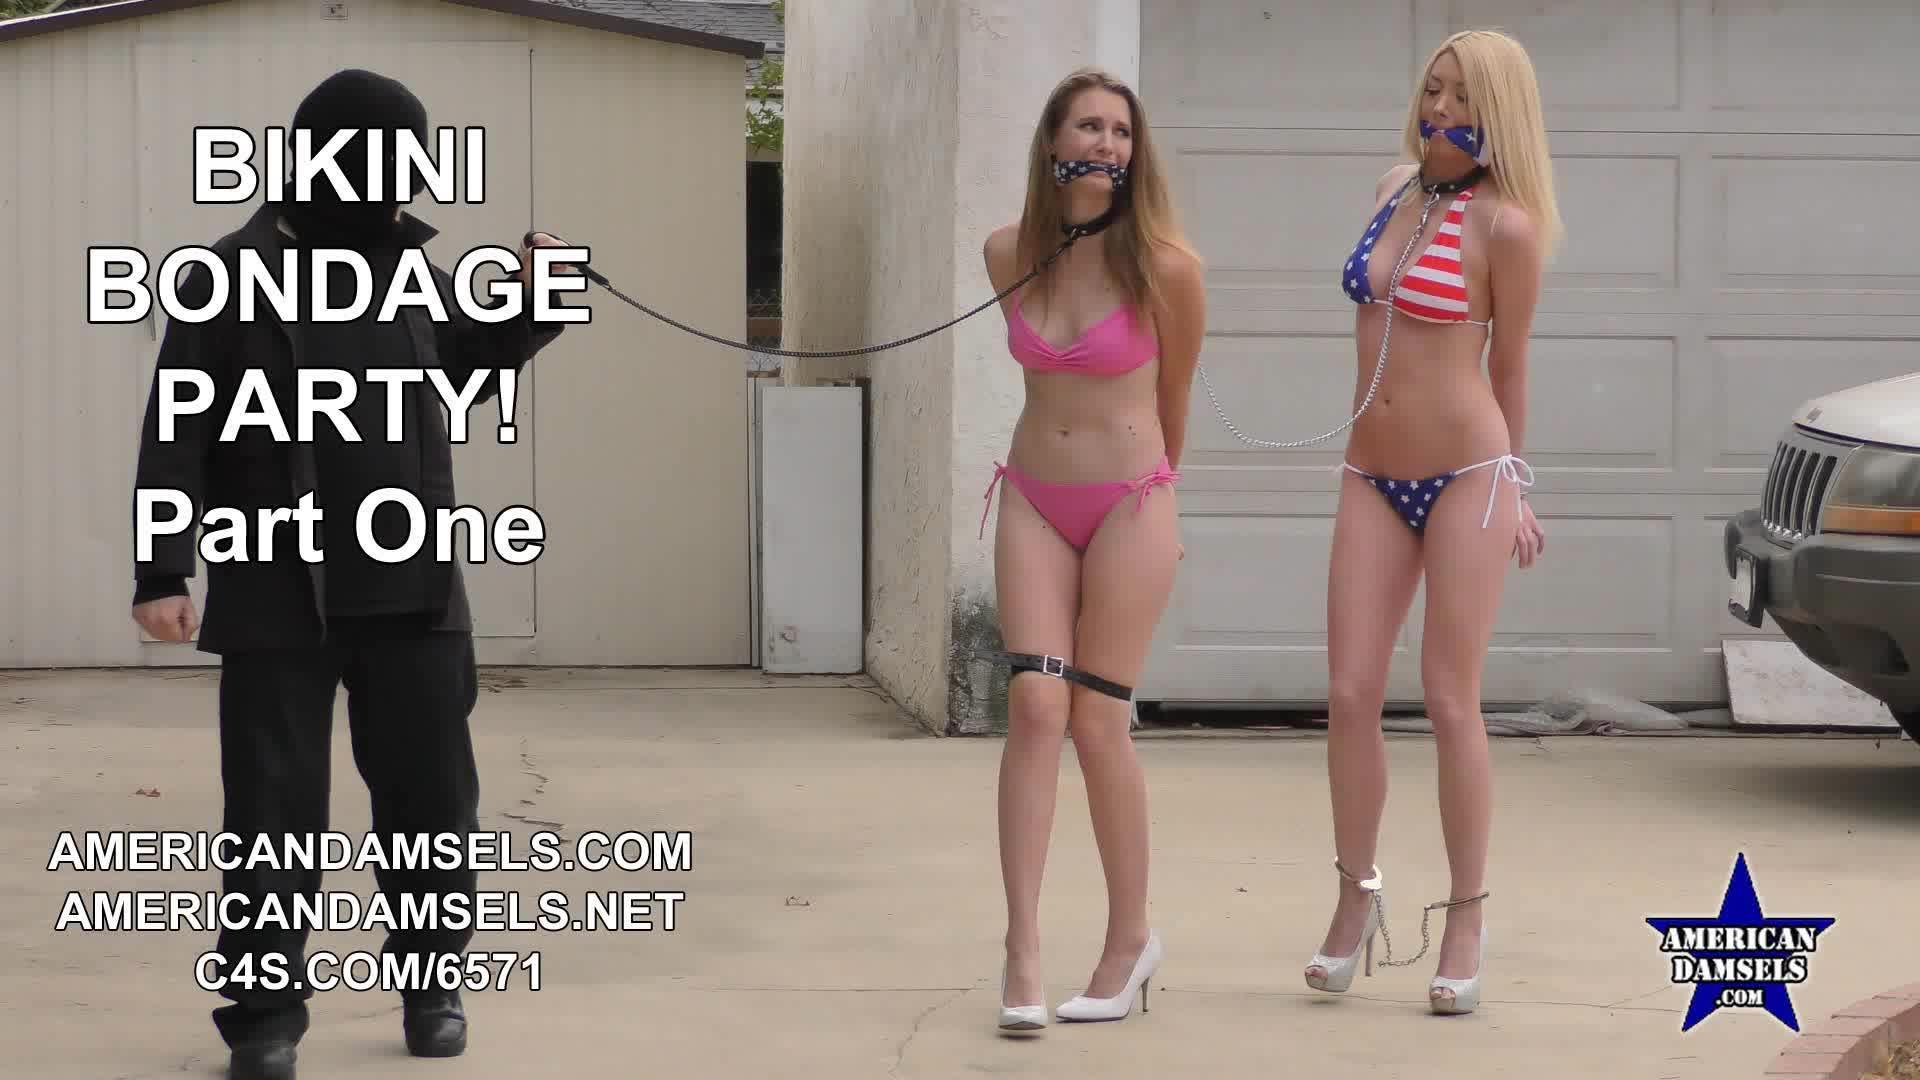 clipspool.com | Bikini Bondage Party! - Part One - Ashley